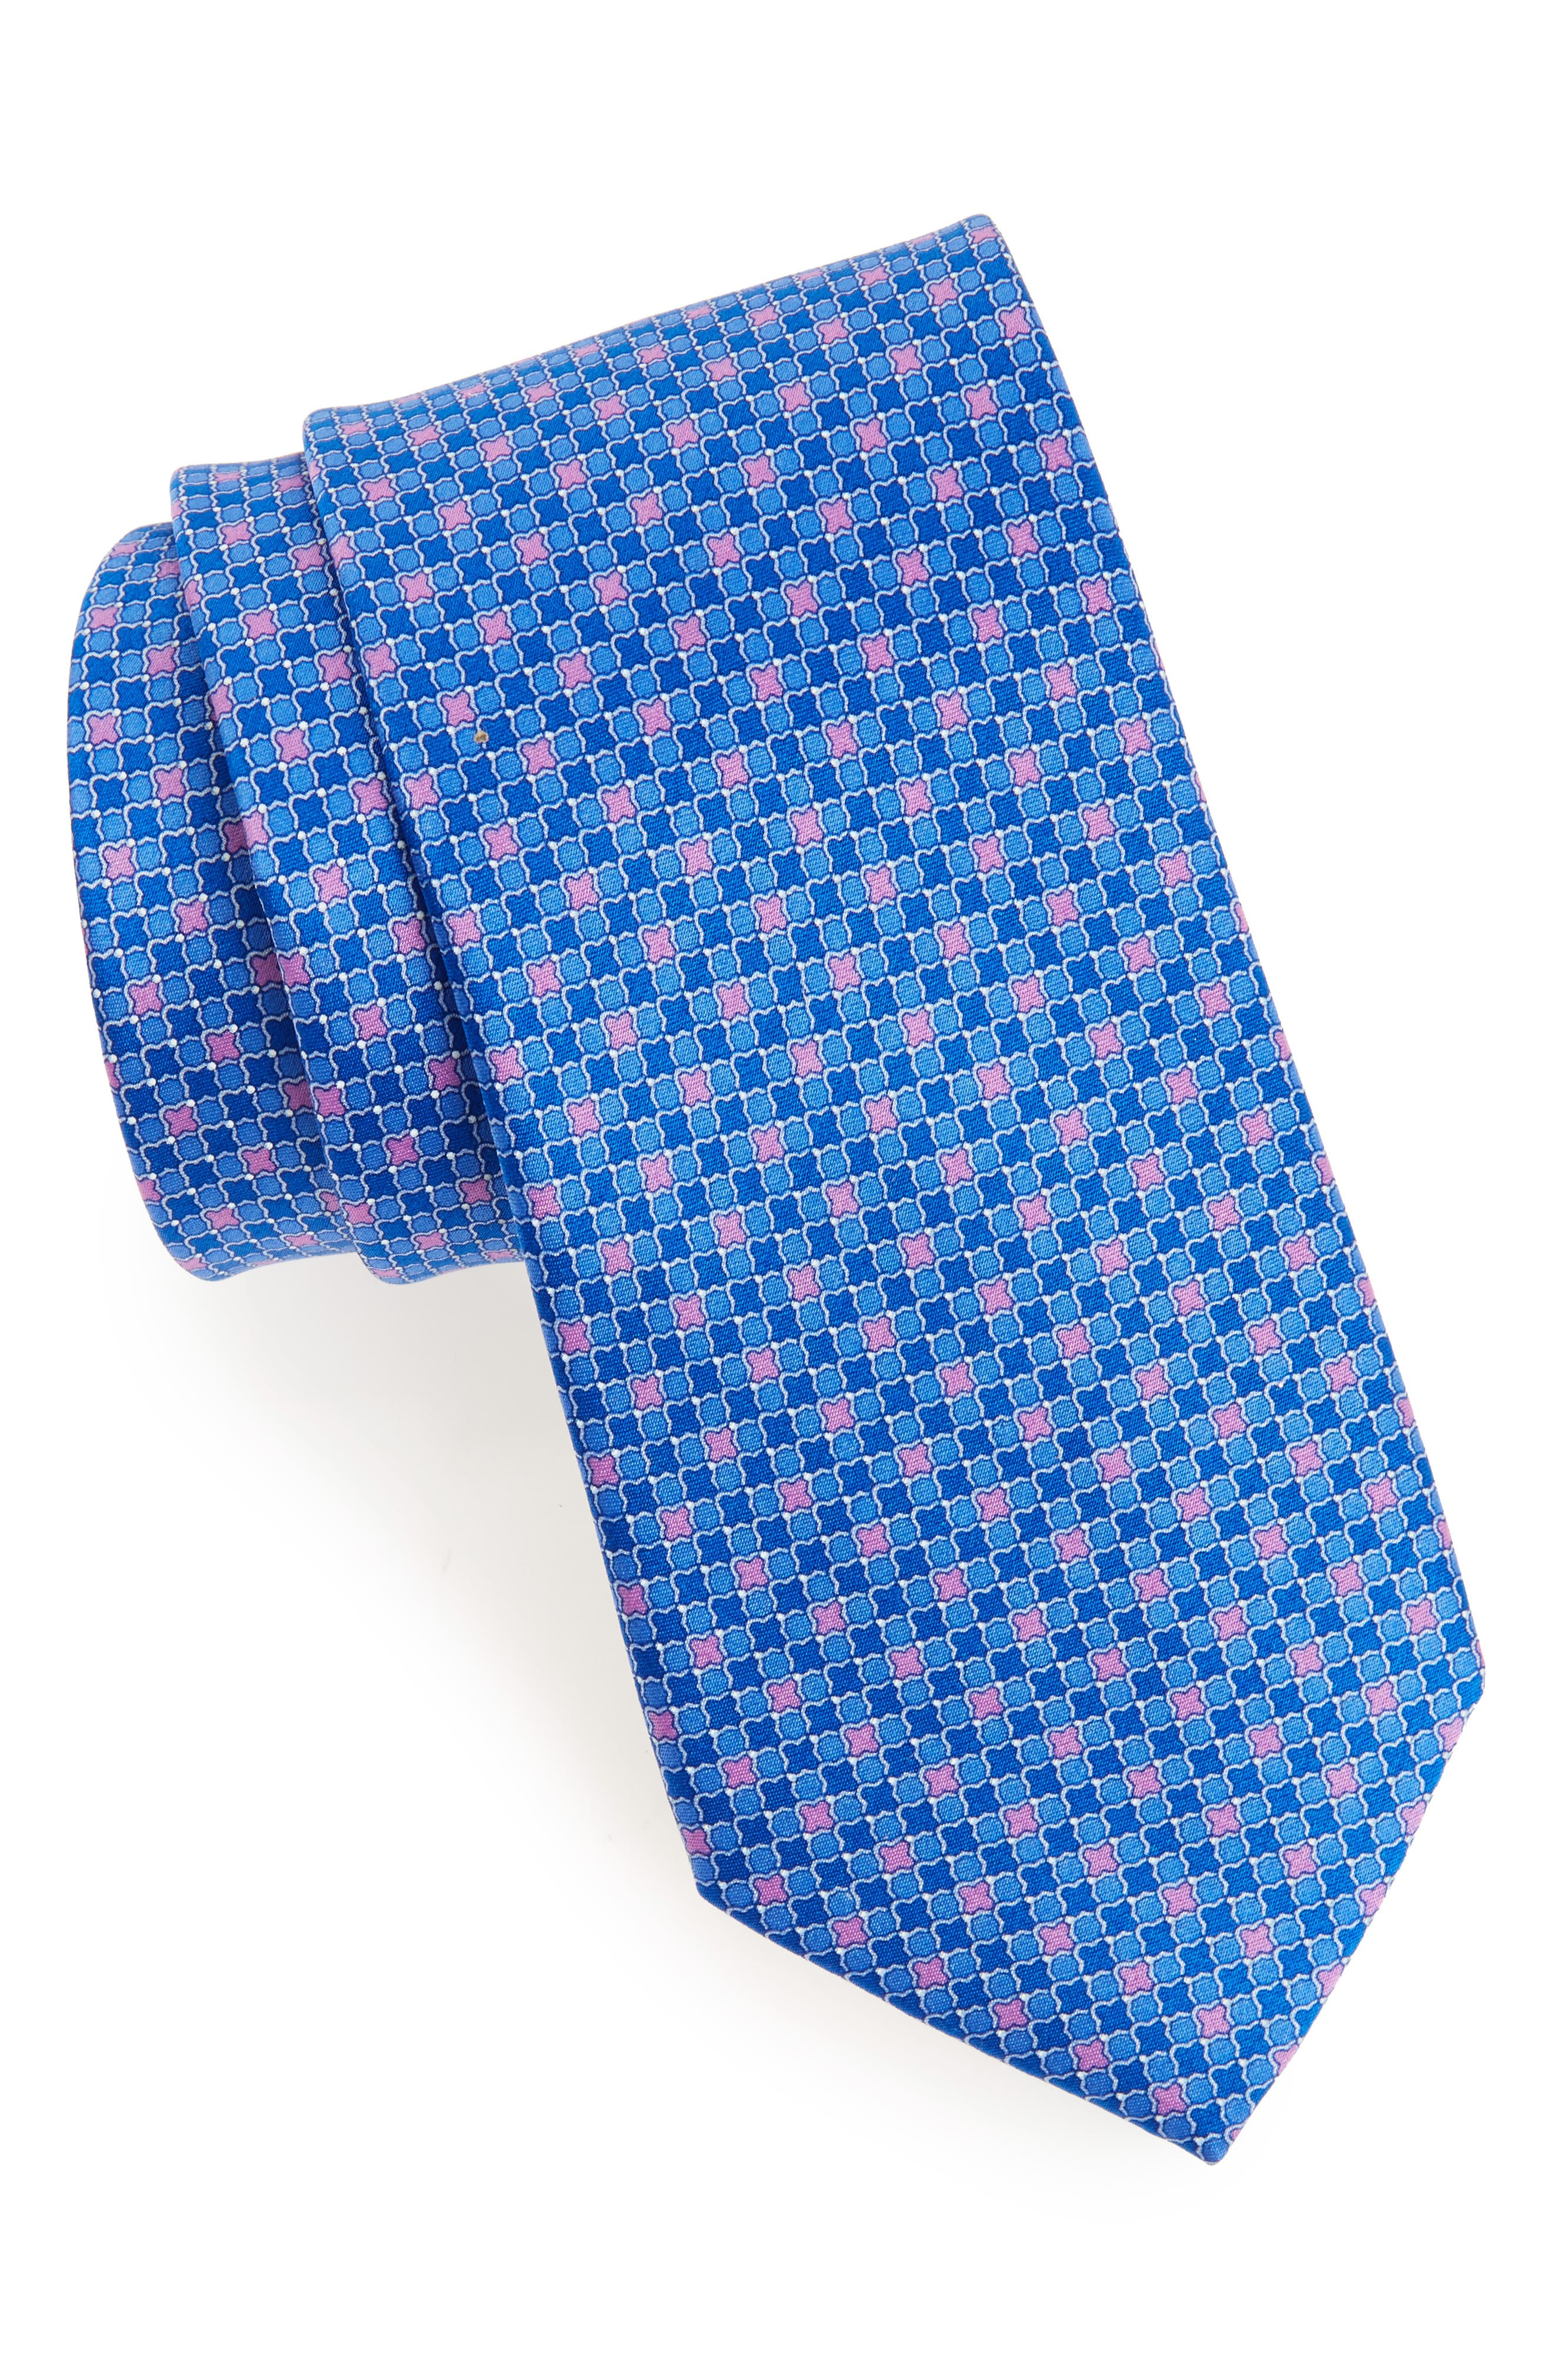 Alternate Image 1 Selected - Nordstrom Men's Shop Geometric Silk Tie